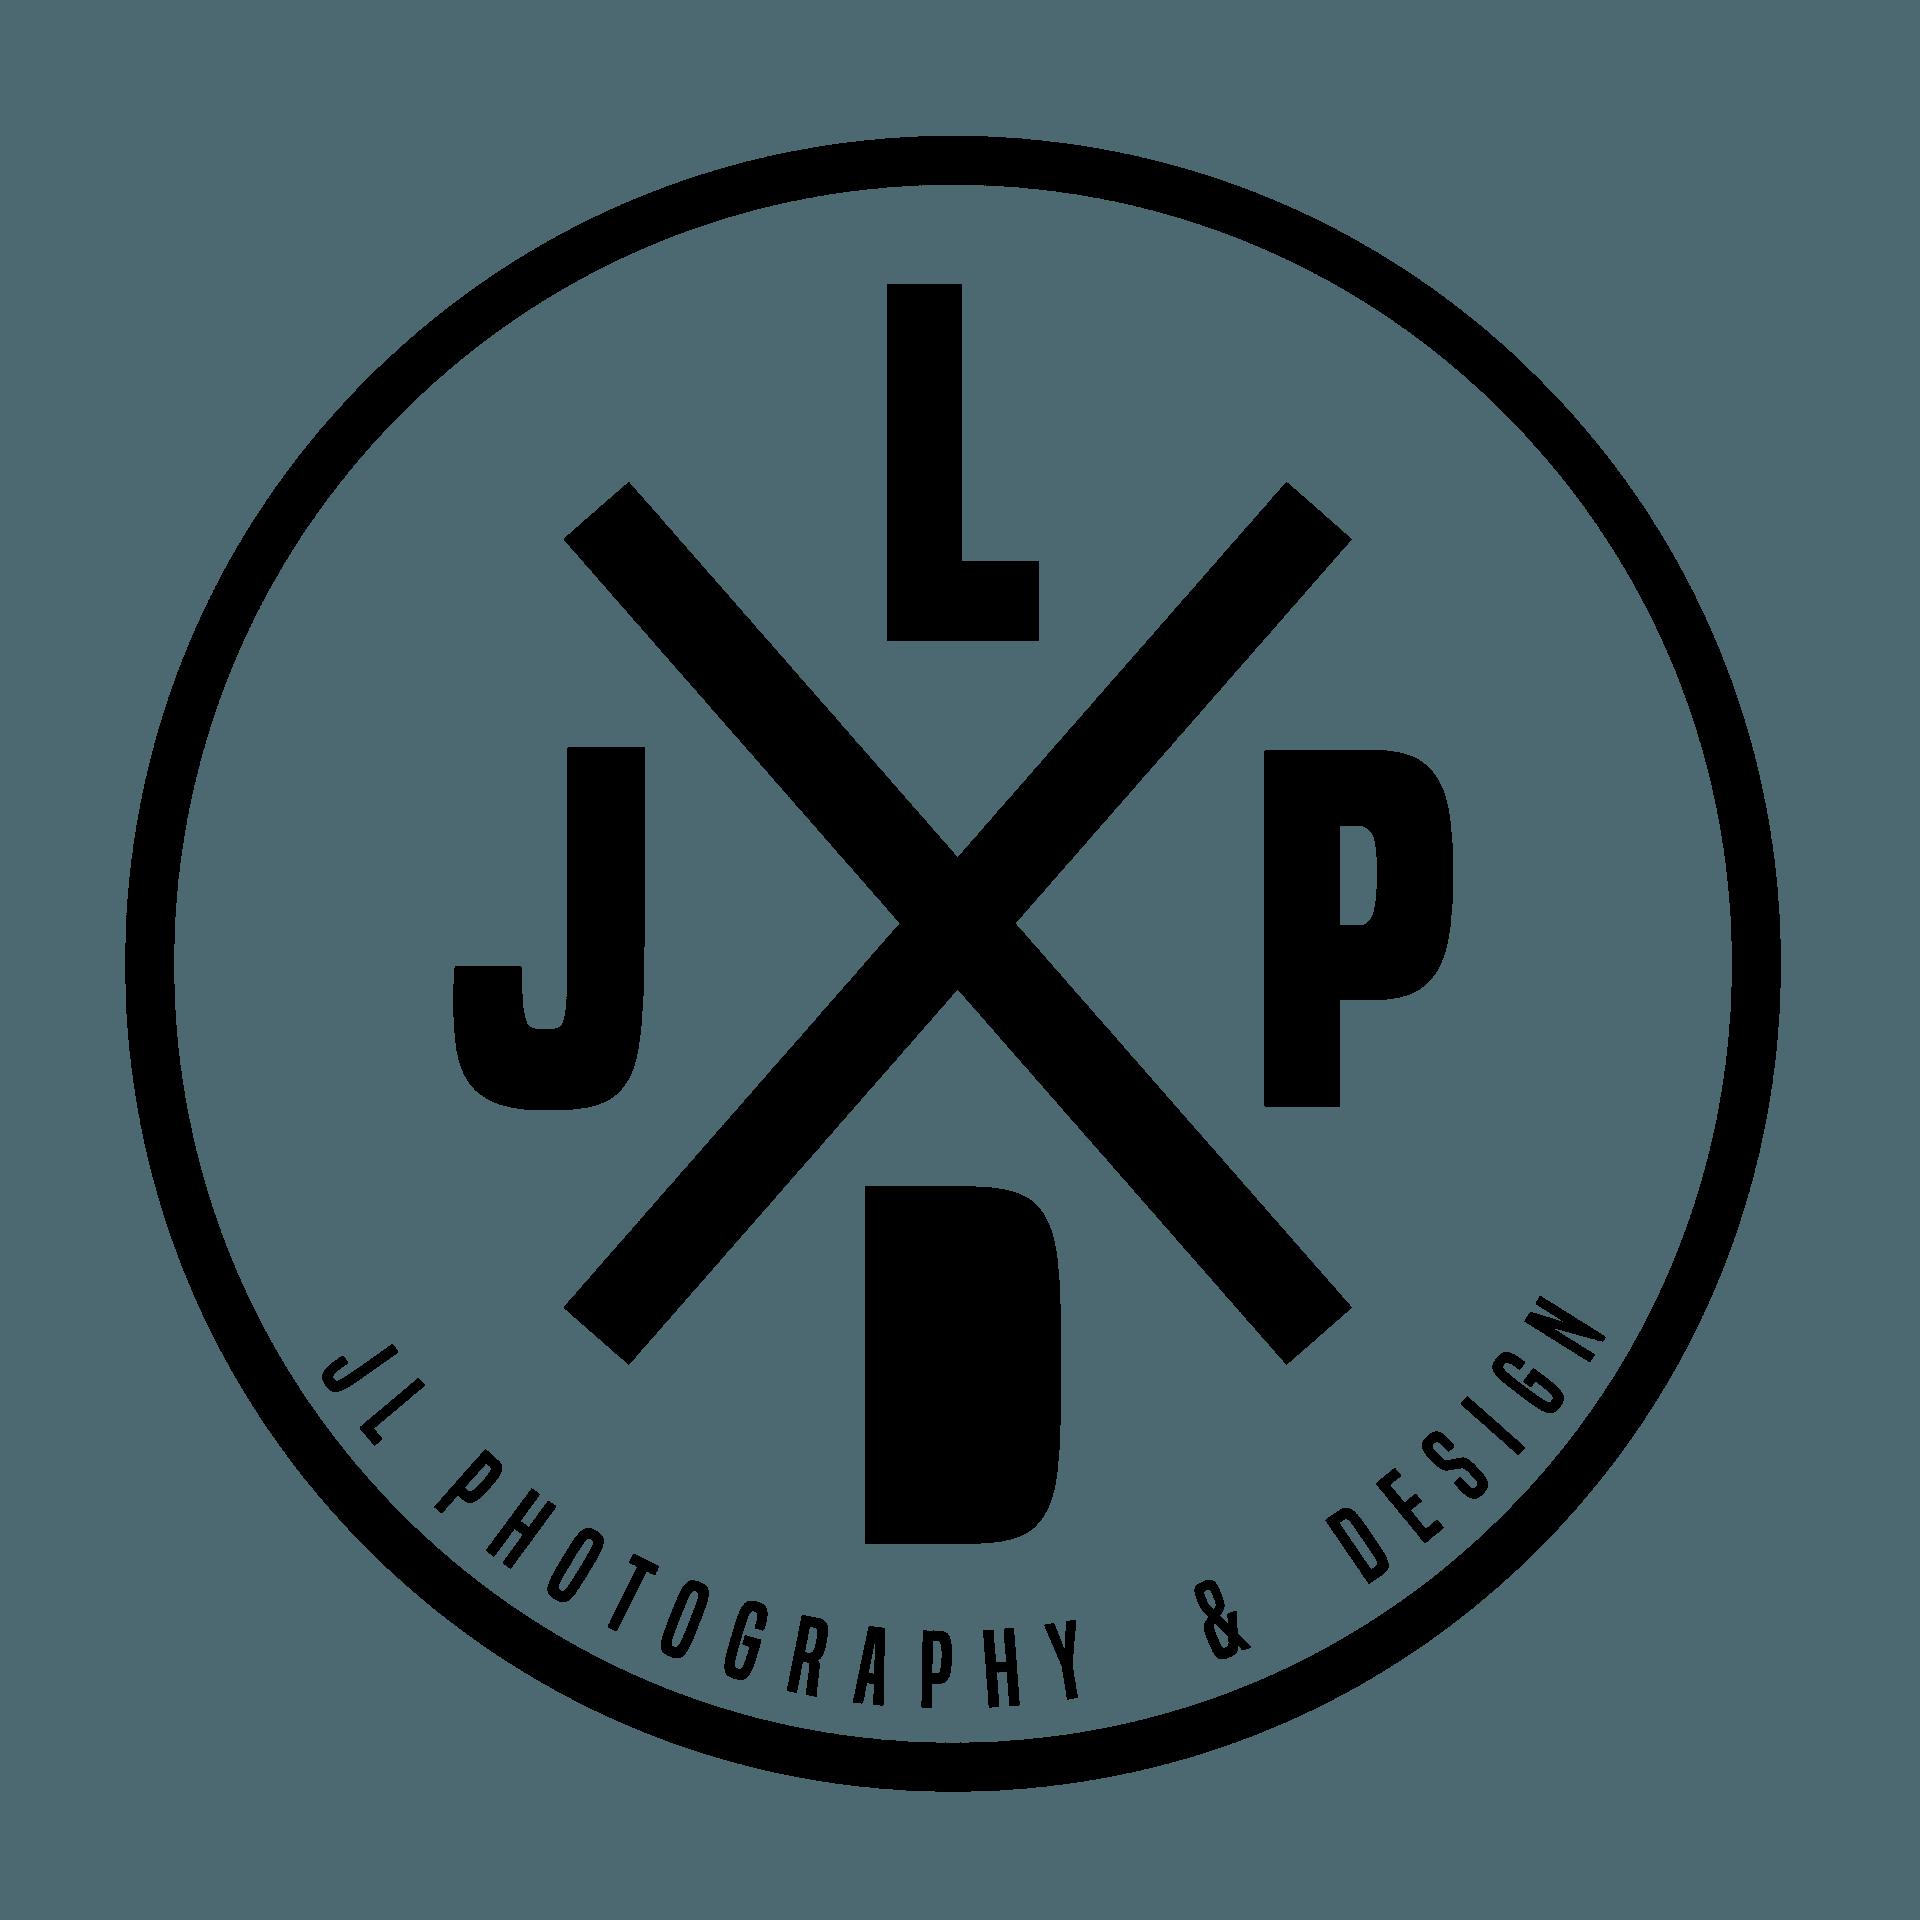 JL Photography & Design link